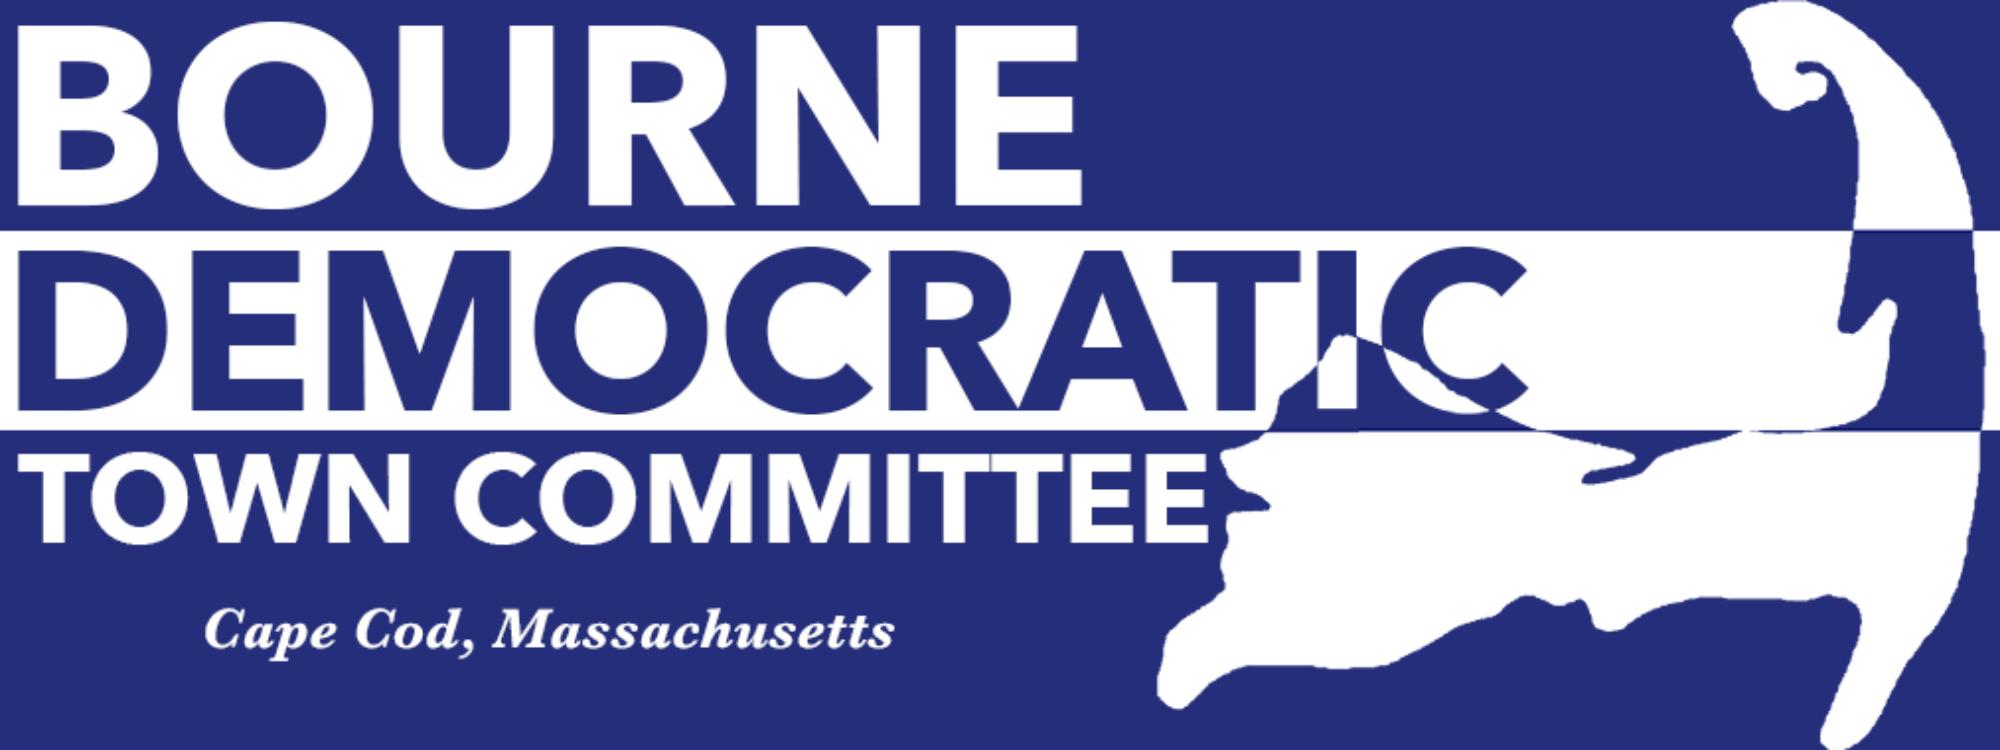 Bourne Democratic Town Committee